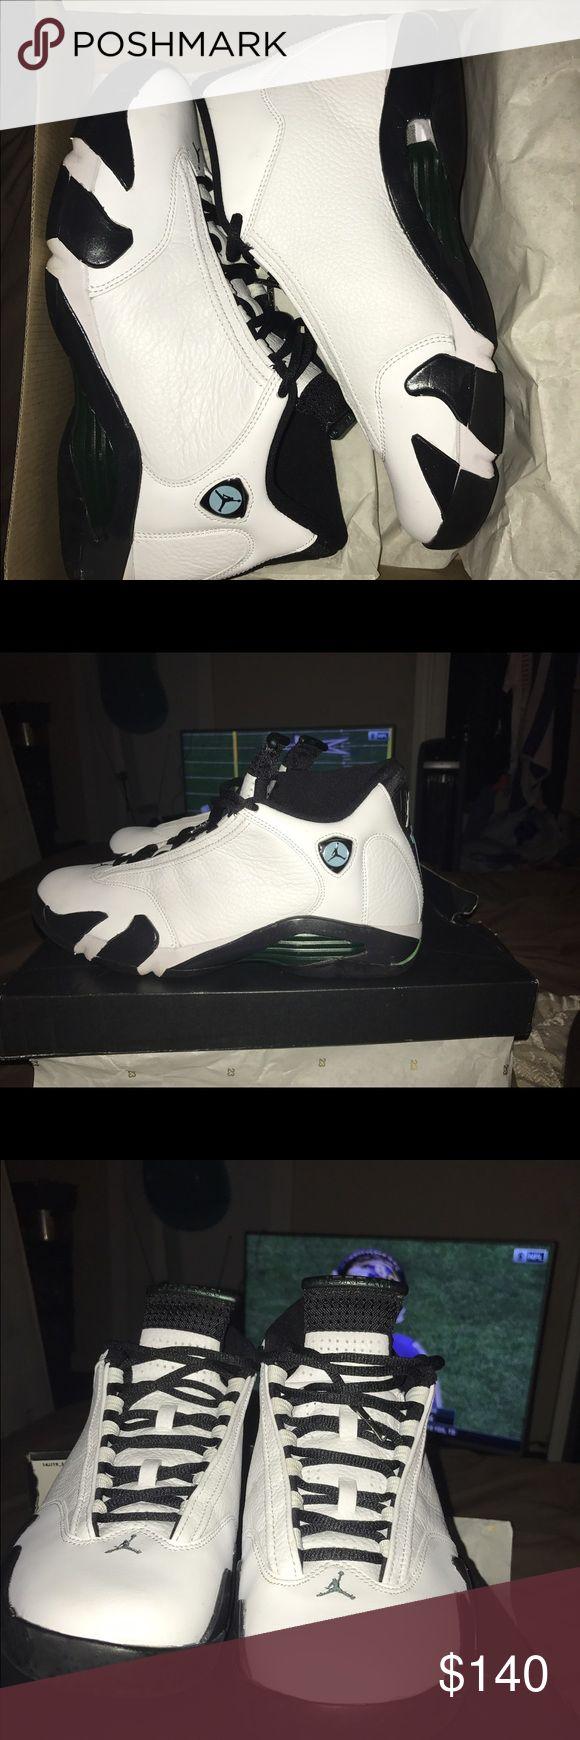 Air Jordan Retro 14 Size 10.5 slighty Used it comes with the box ...Air Jordan Retro 14 Jordan Shoes Sneakers